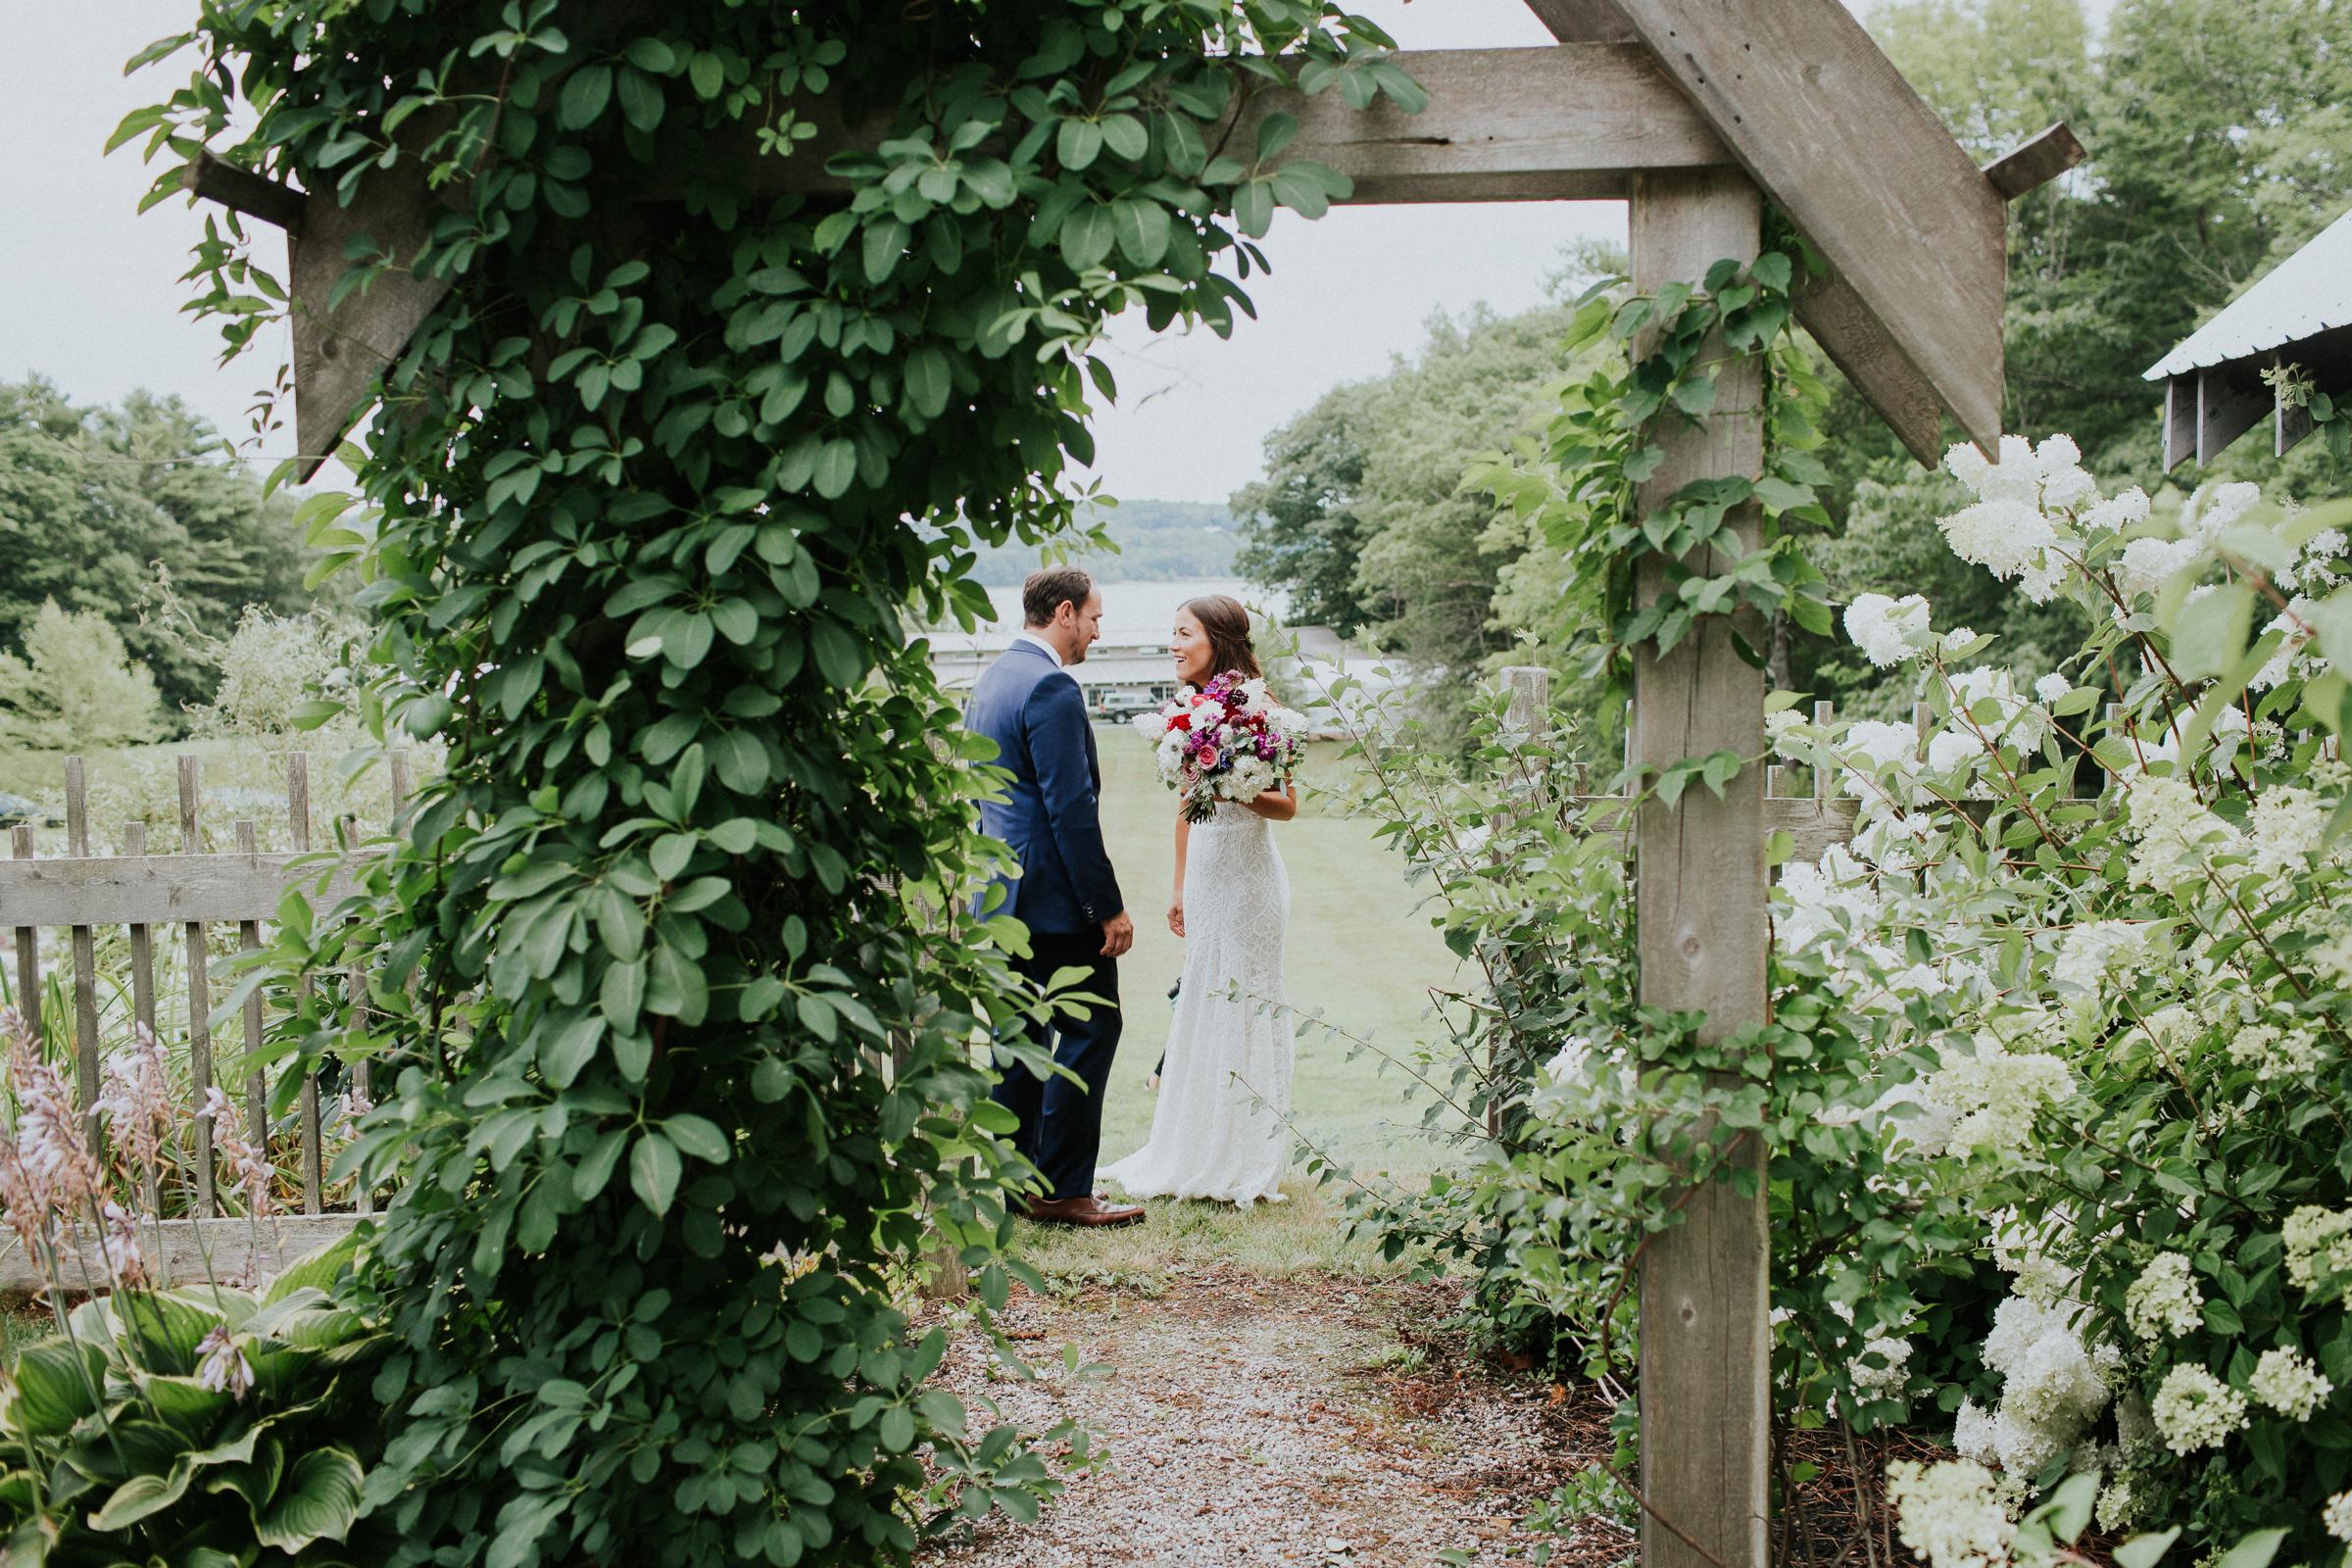 Marianmade-Farm-Wiscasset-Maine-Fine-Art-Documentary-Wedding-Photographer-Elvira-Kalviste-Photography-32.jpg